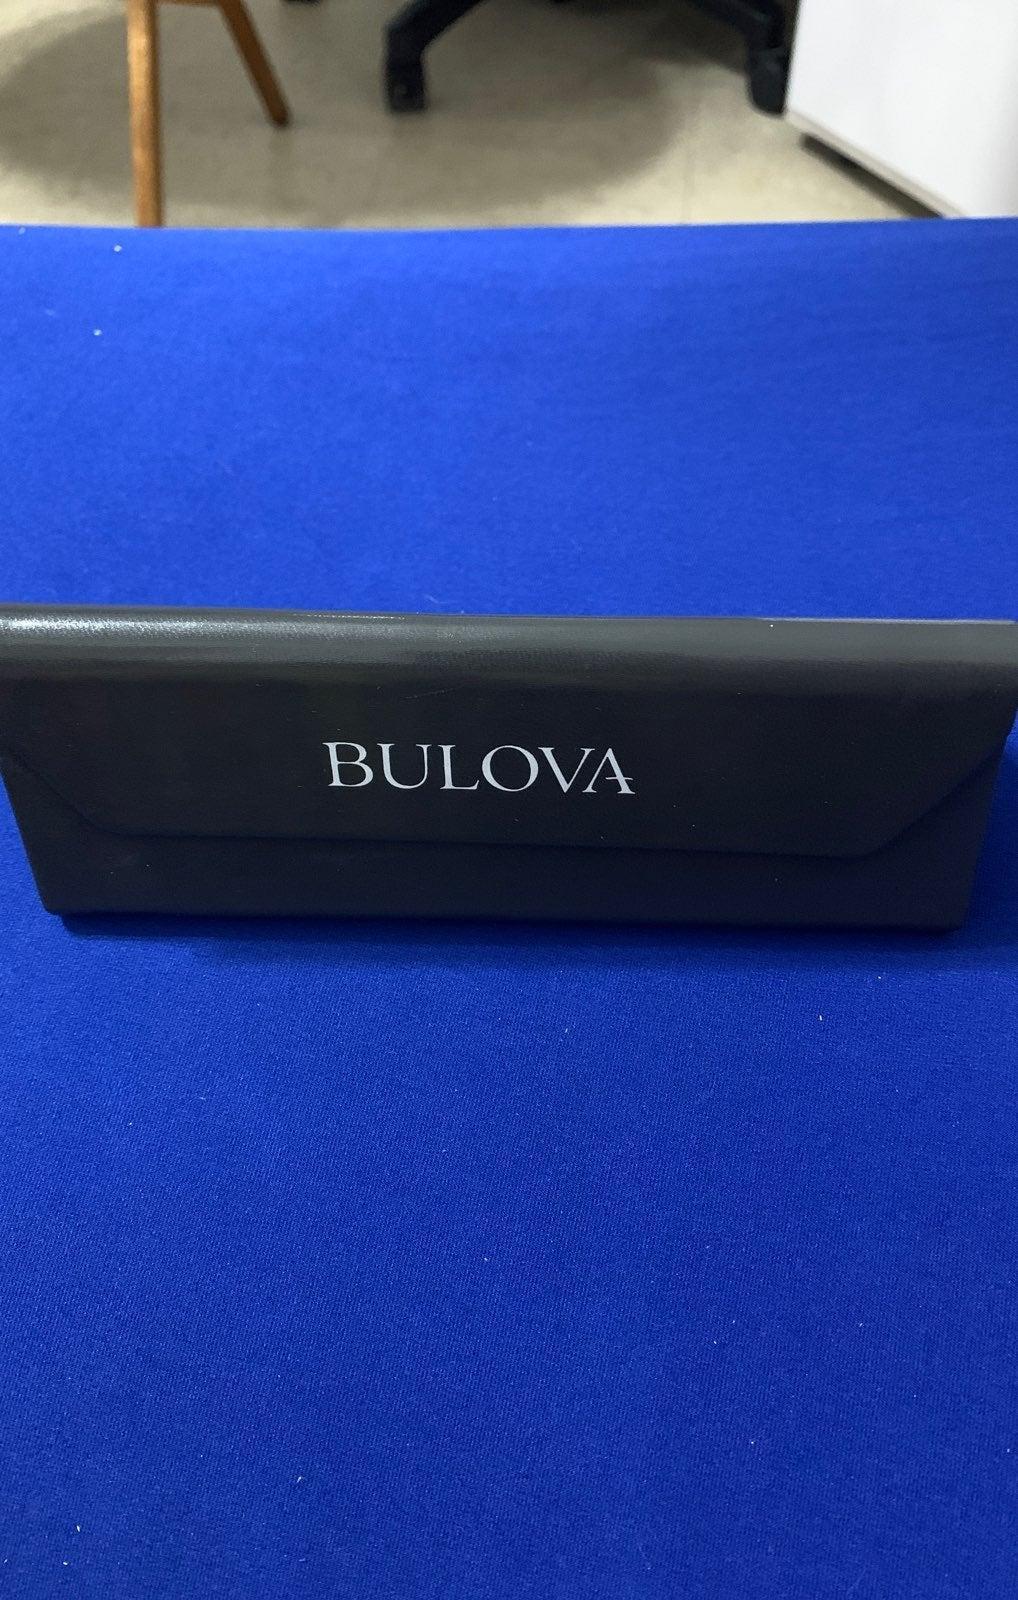 Bulova sunglasses case